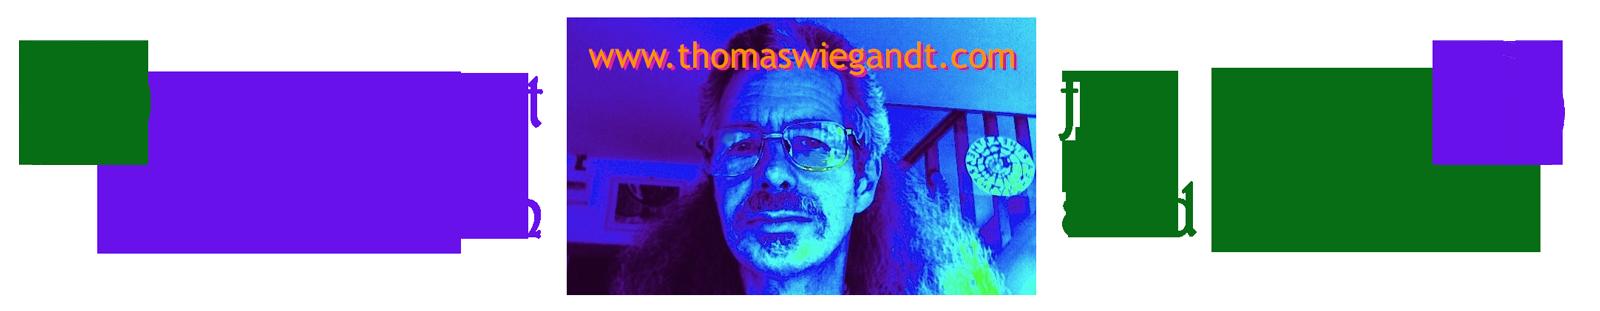 Thomas Wiegandt Banner